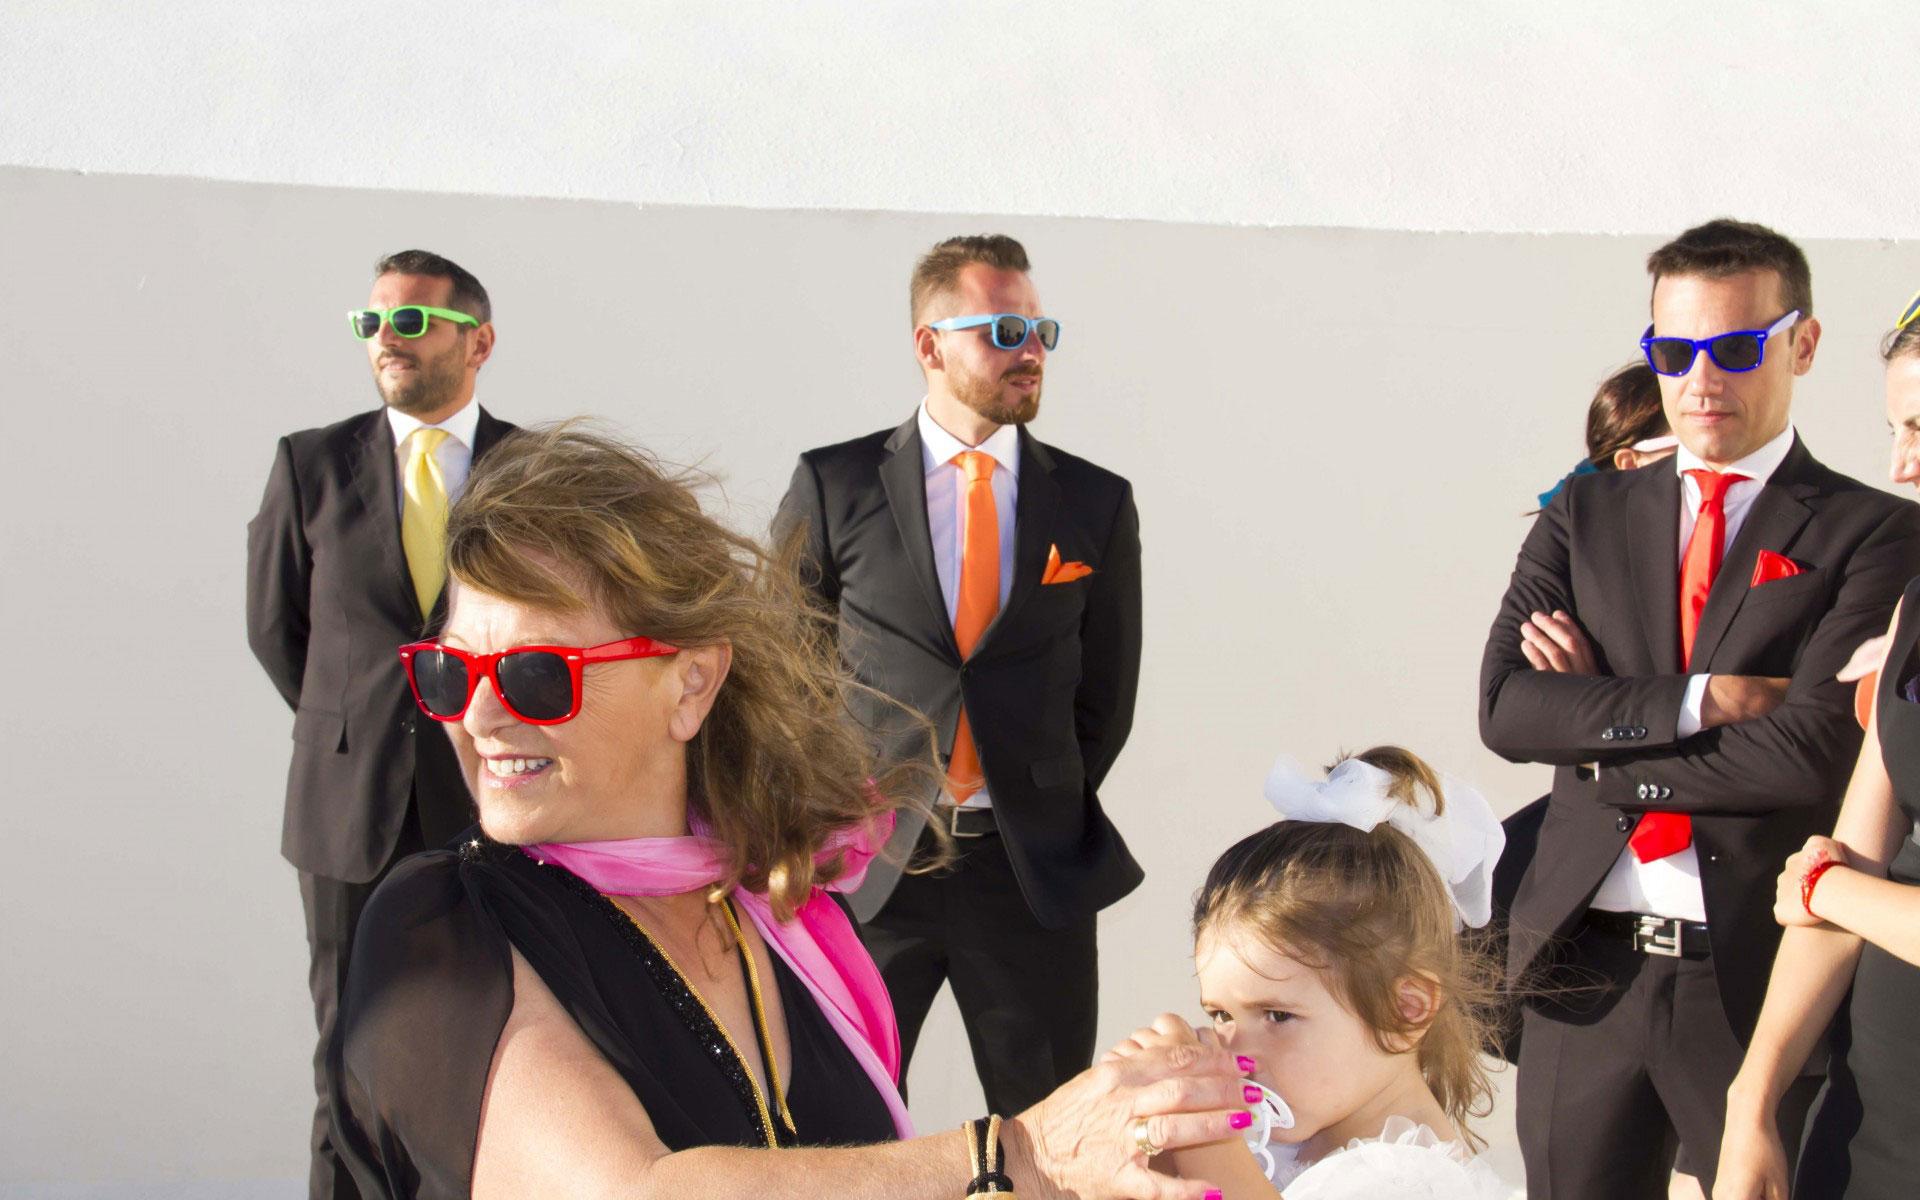 Matrimonio Santorini Rainbow dettagli colorati